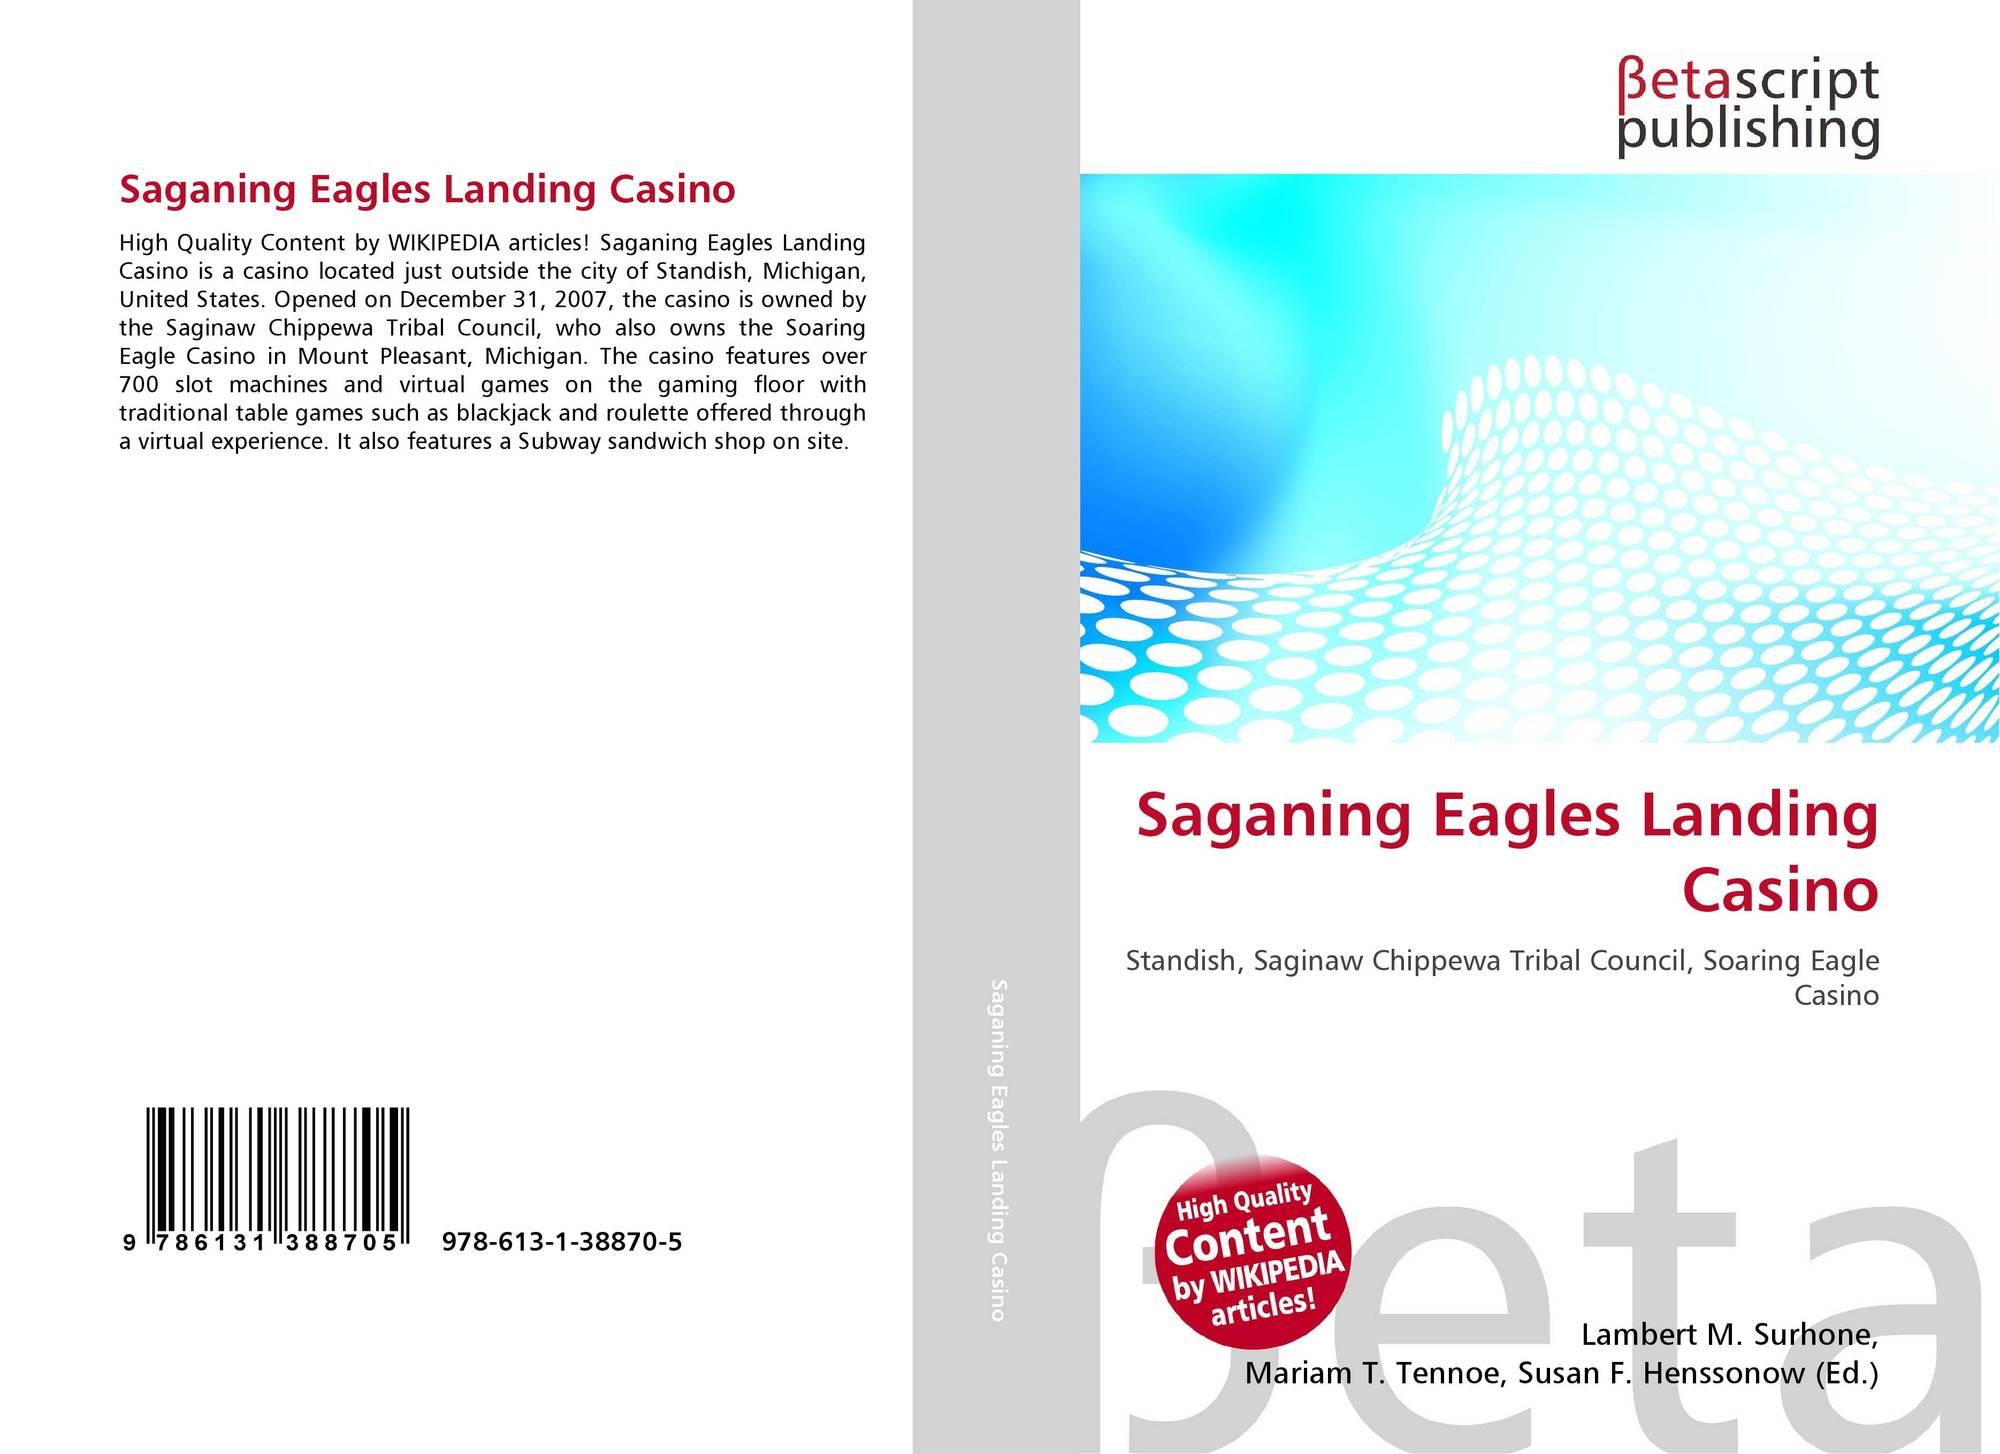 Saganing eagles landing casino diy casino night games